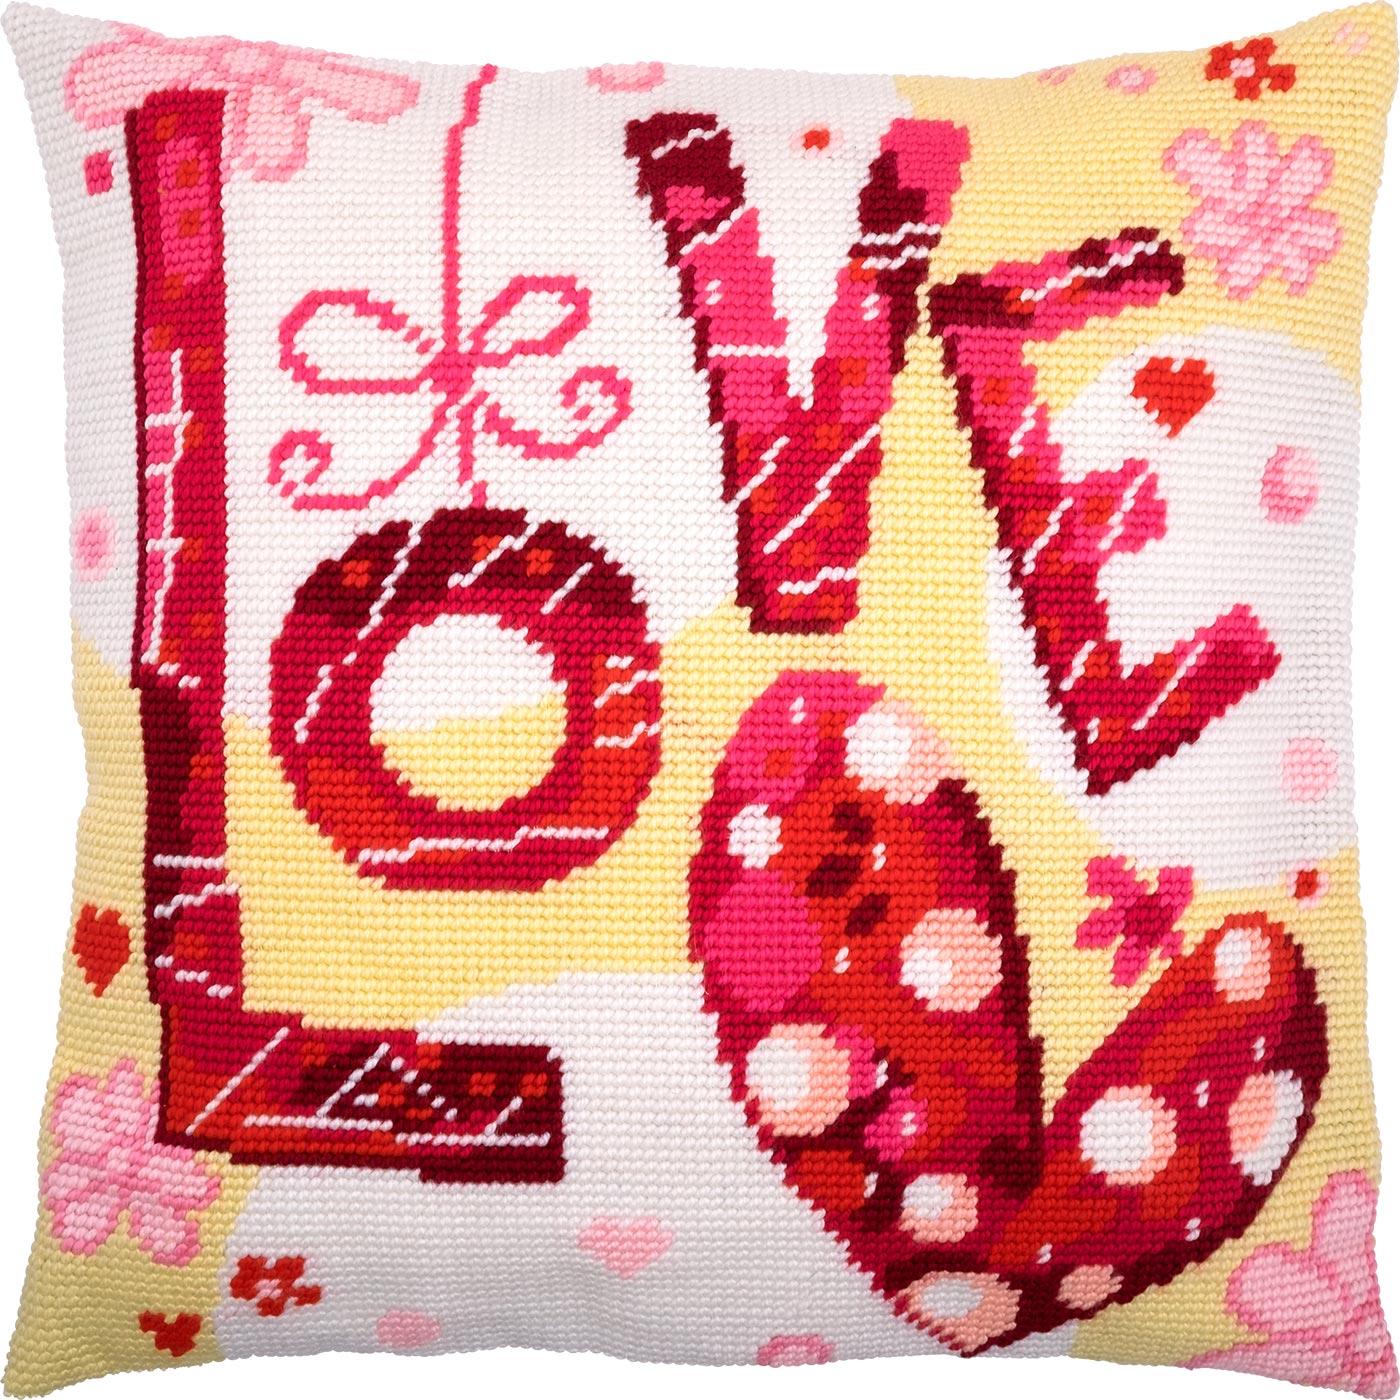 V223 — Love